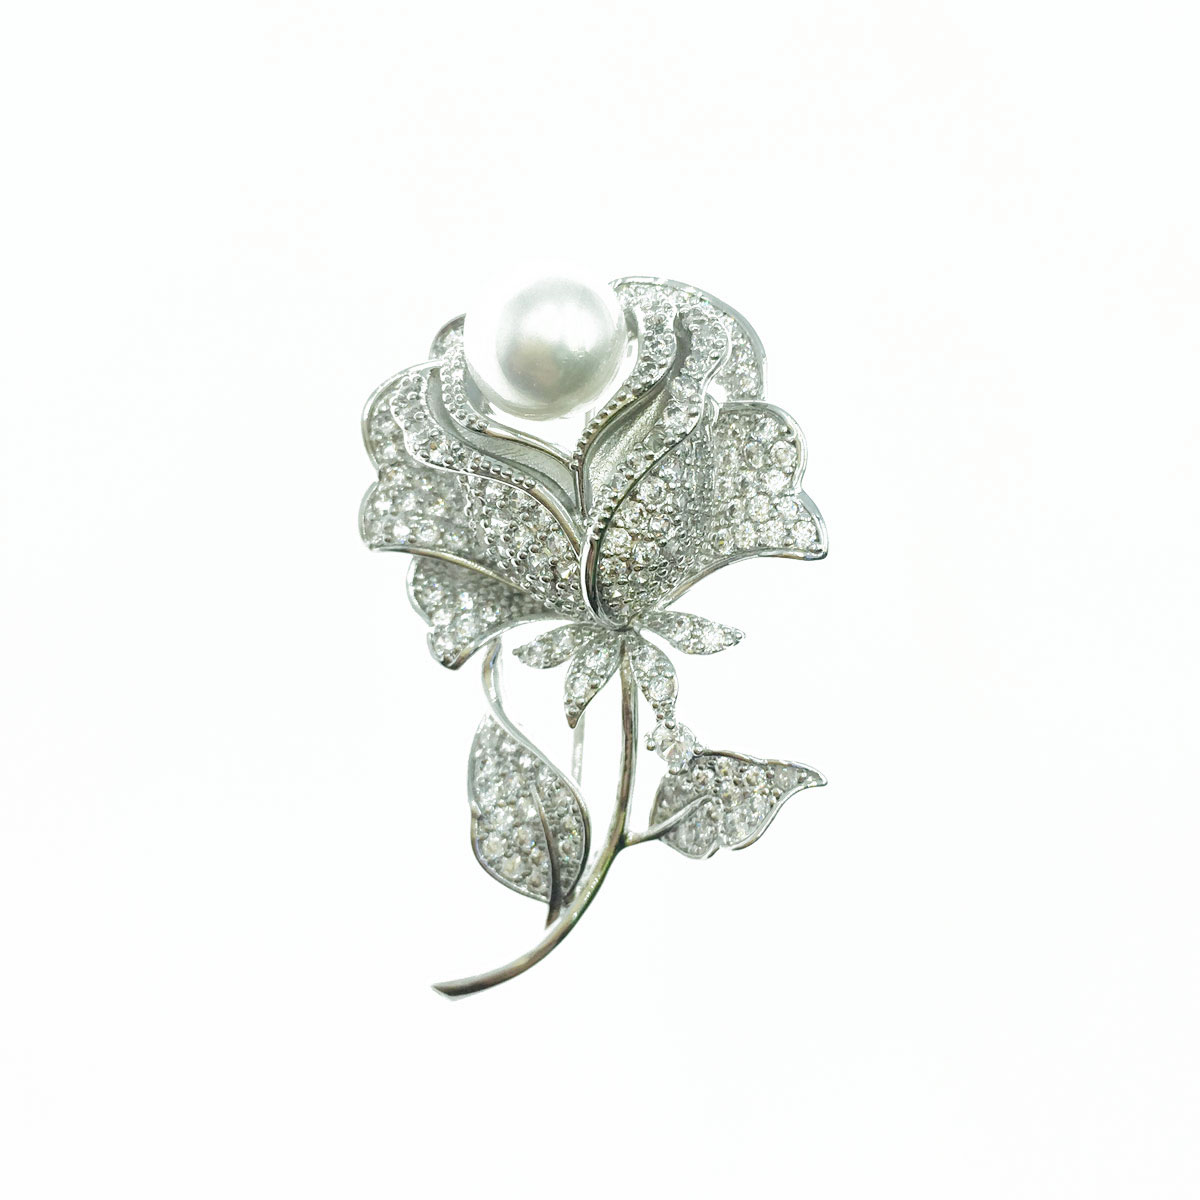 珍珠玫瑰 水鑽 白鑽 銀色 別針 胸針 採用施華洛世奇水晶元素 Crystals from Swarovski